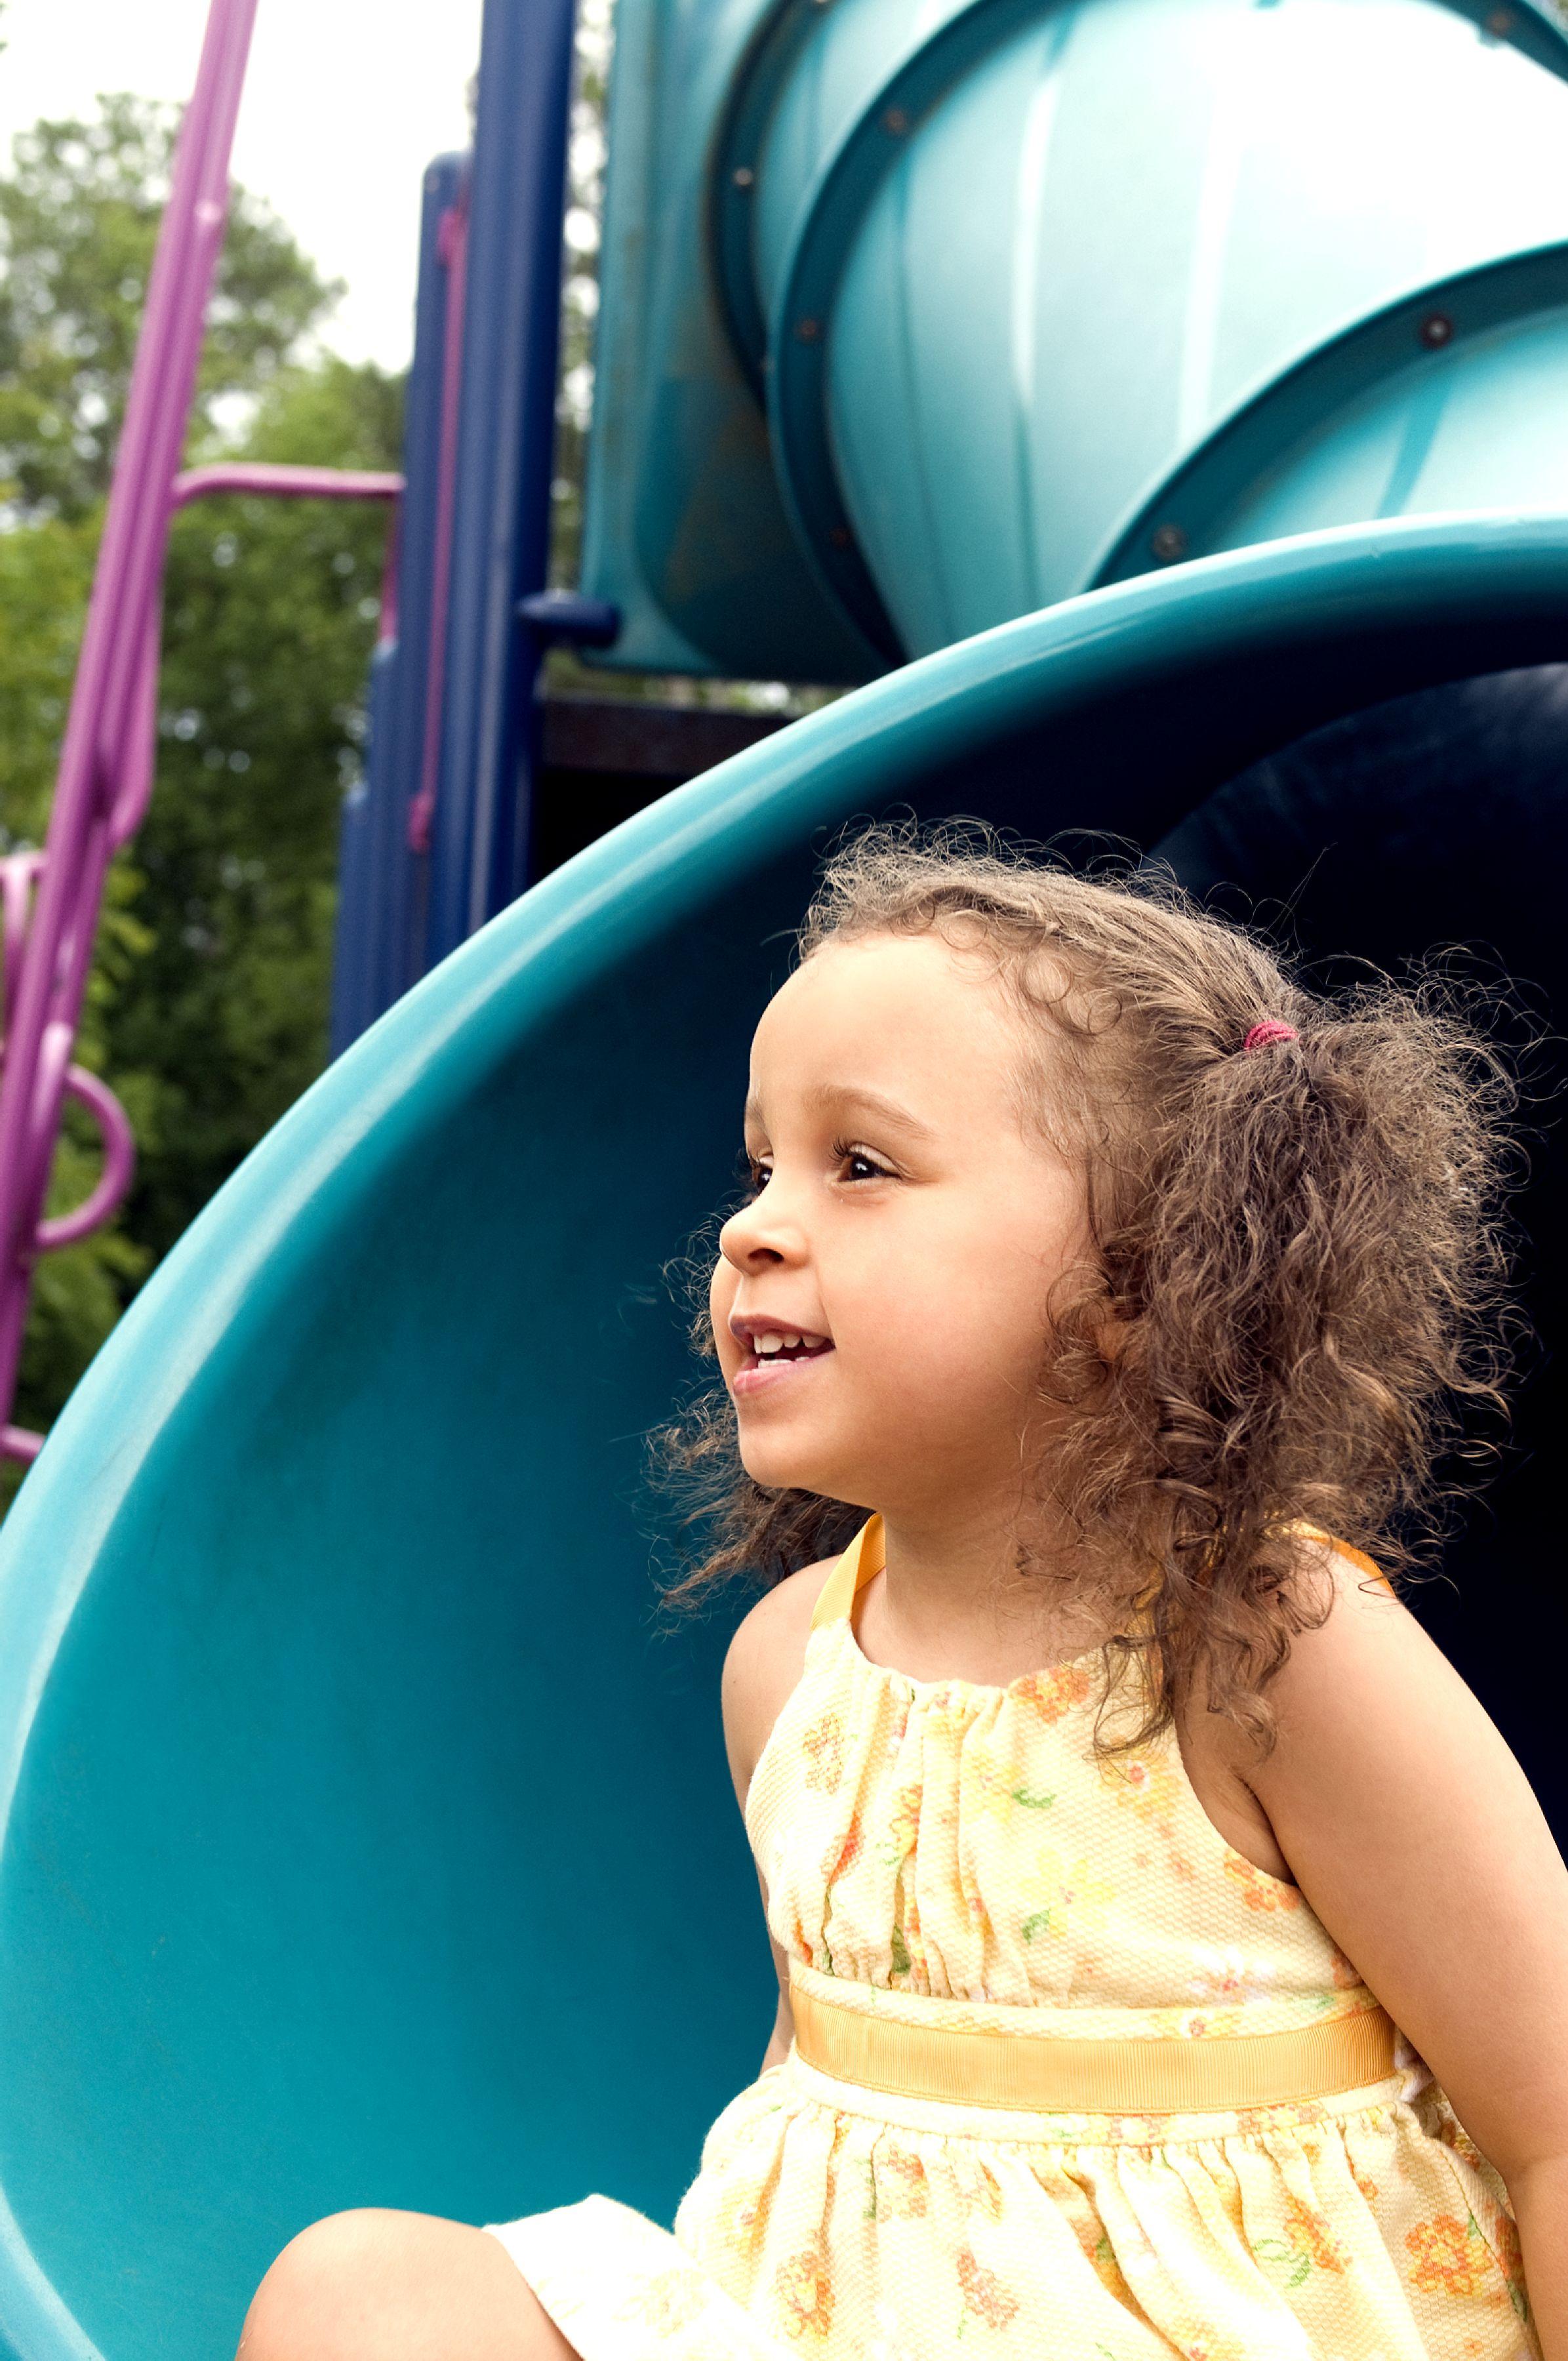 Free photograph; young, girl, having, fun, playing, rides